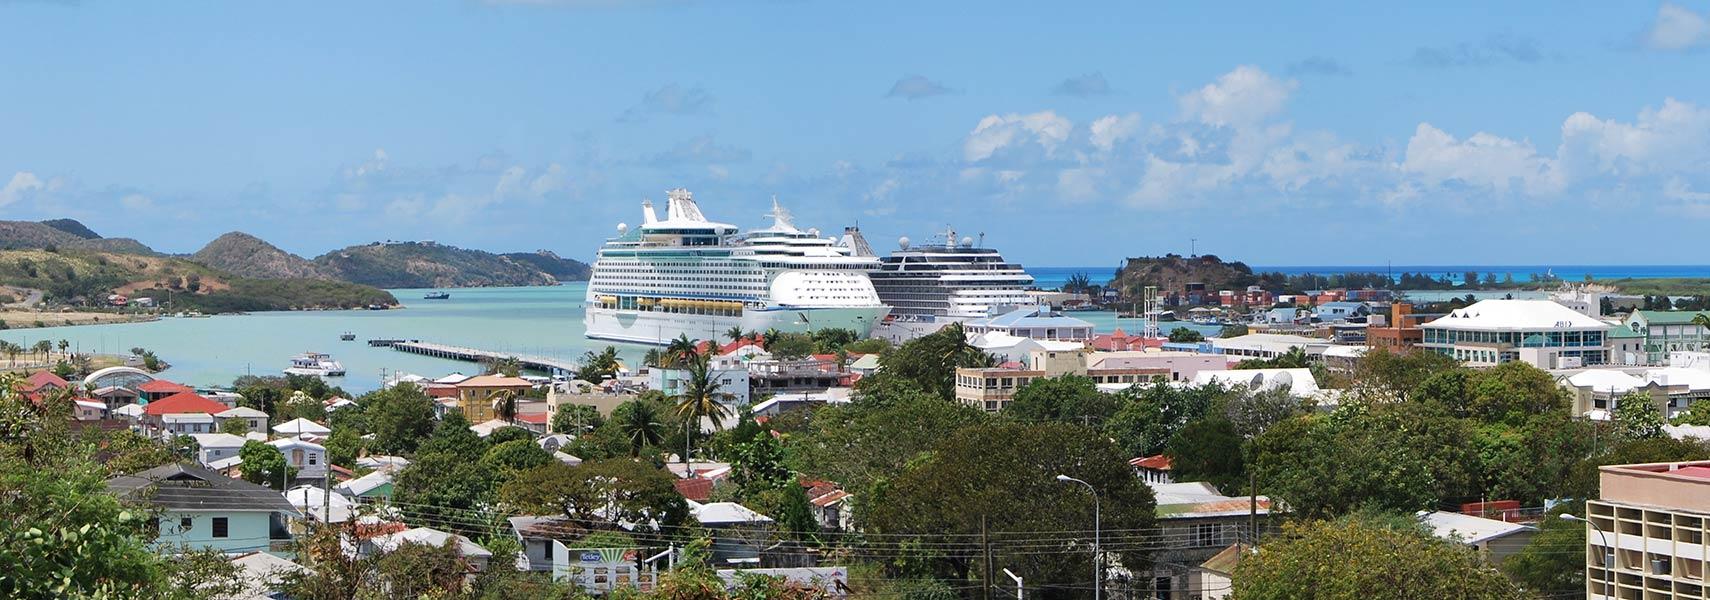 Barbuda Largest And Antigua City